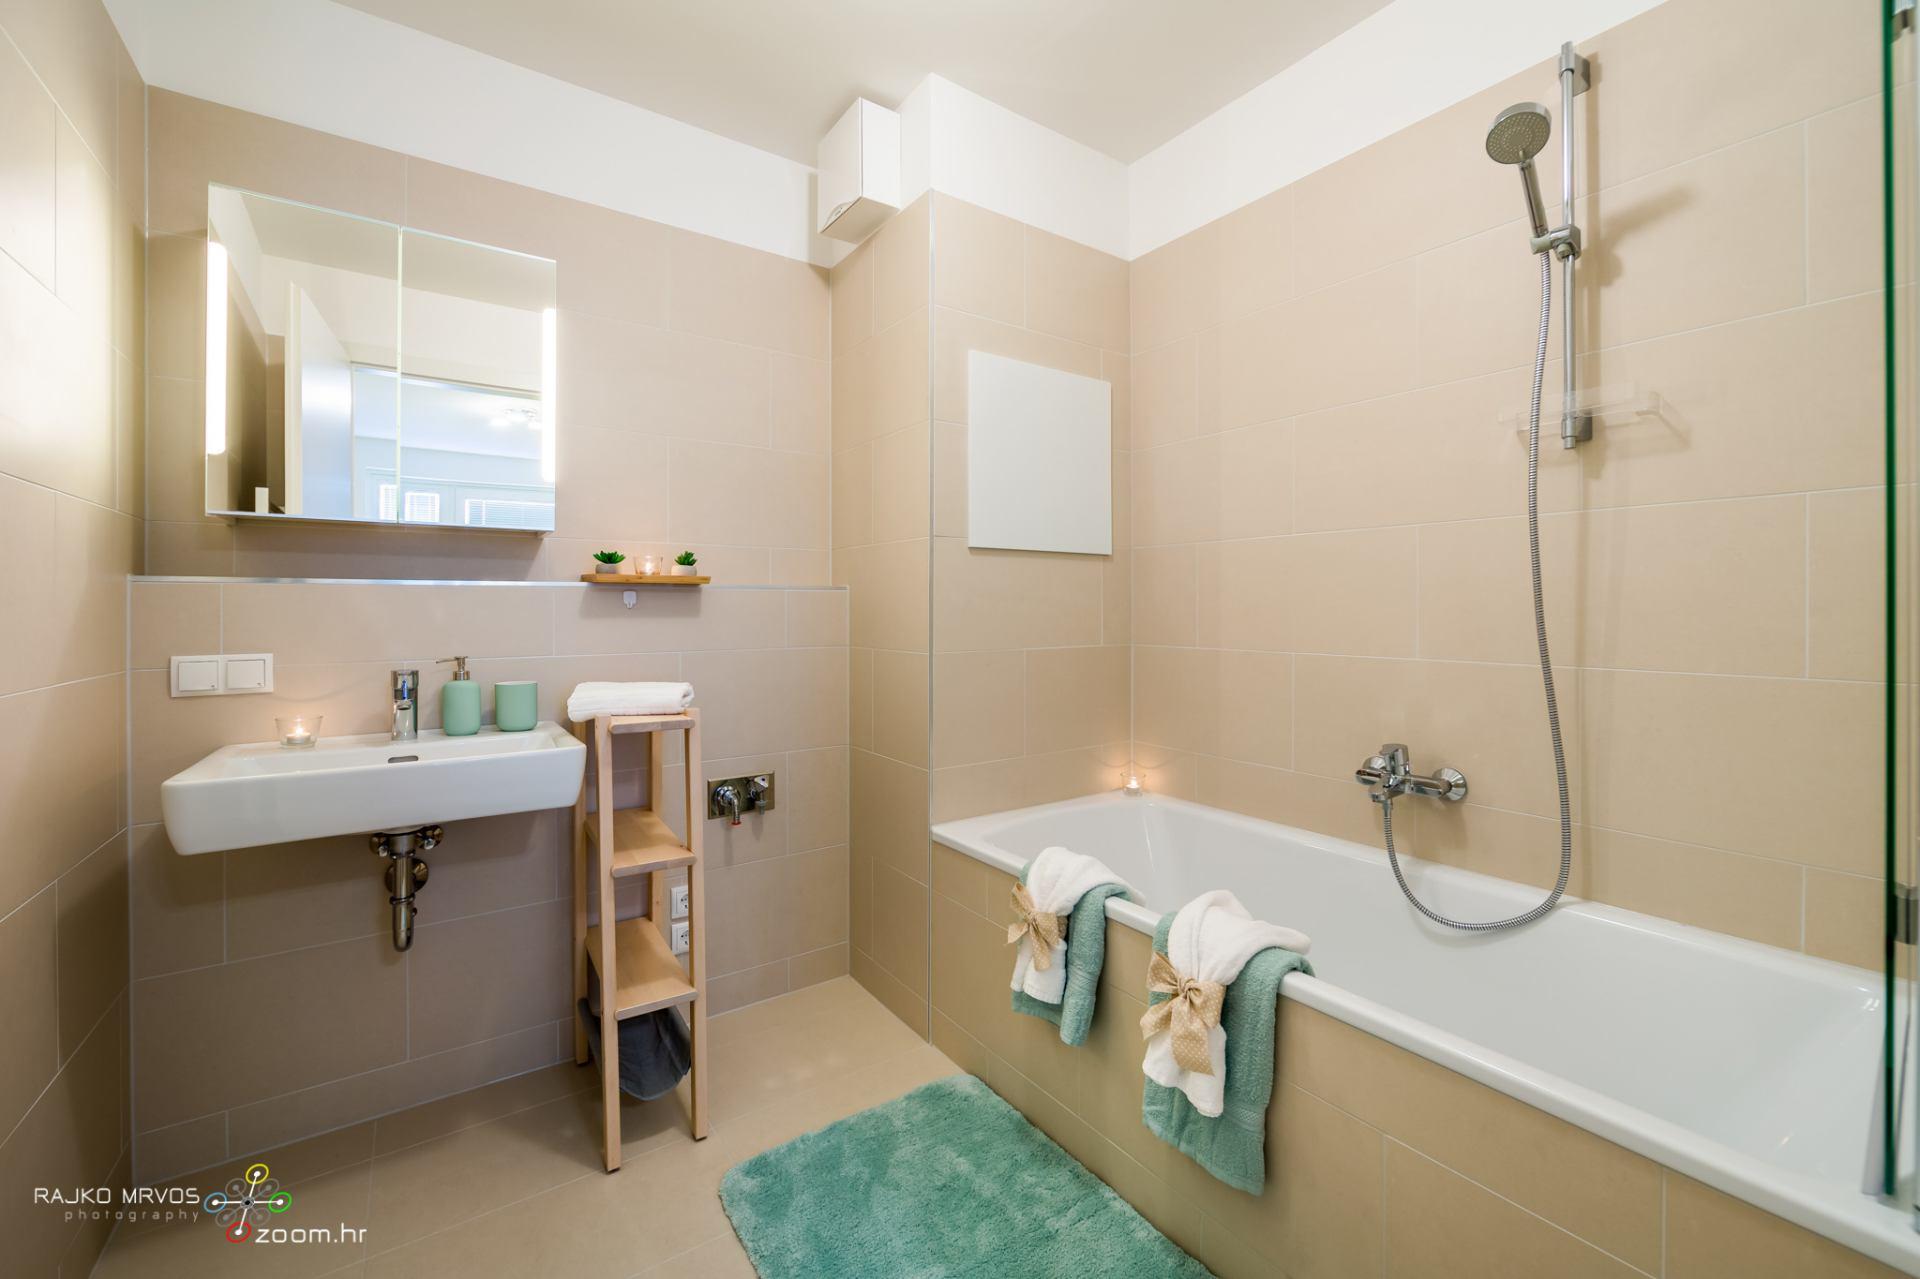 fotografiranje-interijera-fotograf-eksterijera-apartmana-vila-kuca-apartman-Beč-39